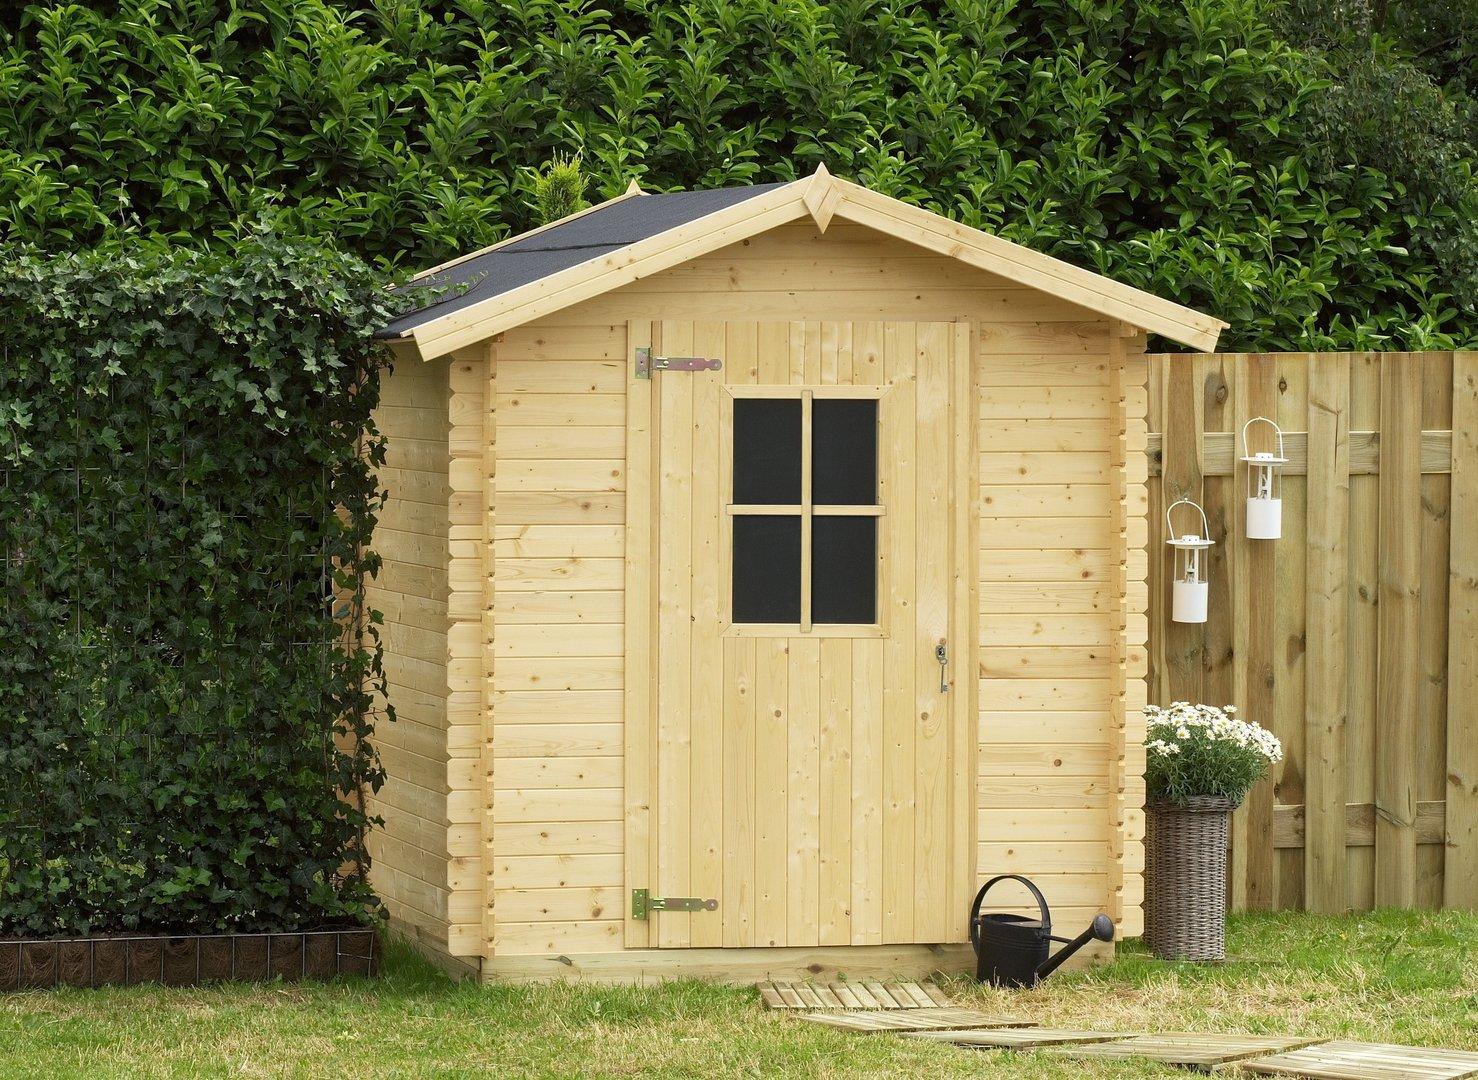 Casetta legno londra gartenpro bricowood net for Casetta giardino bambini usata